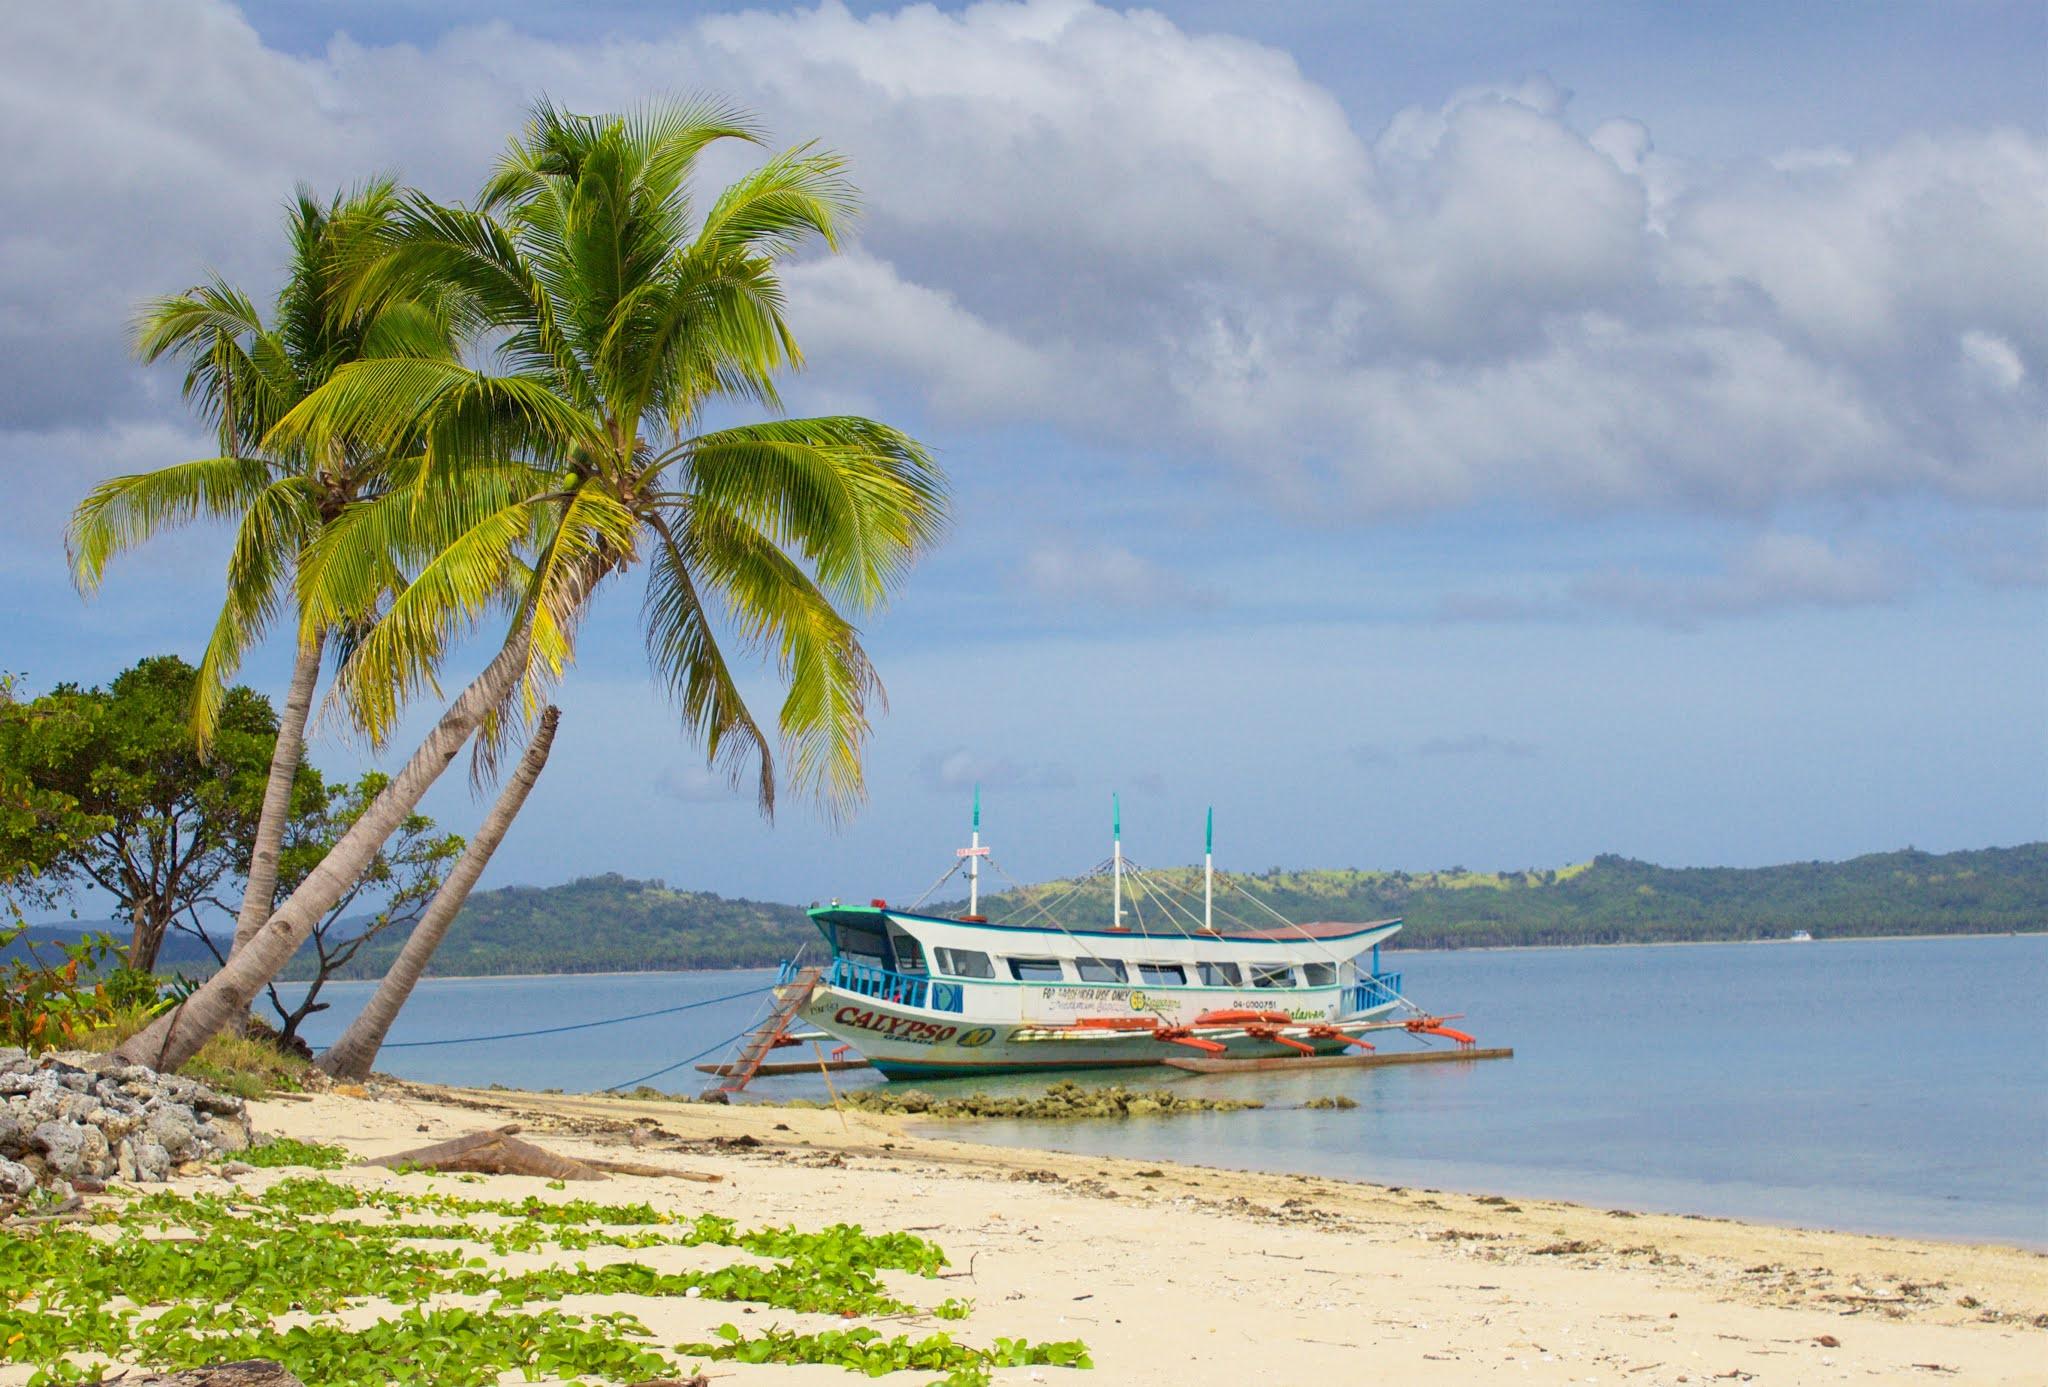 Залив Хонда на Палаван, Филиппины